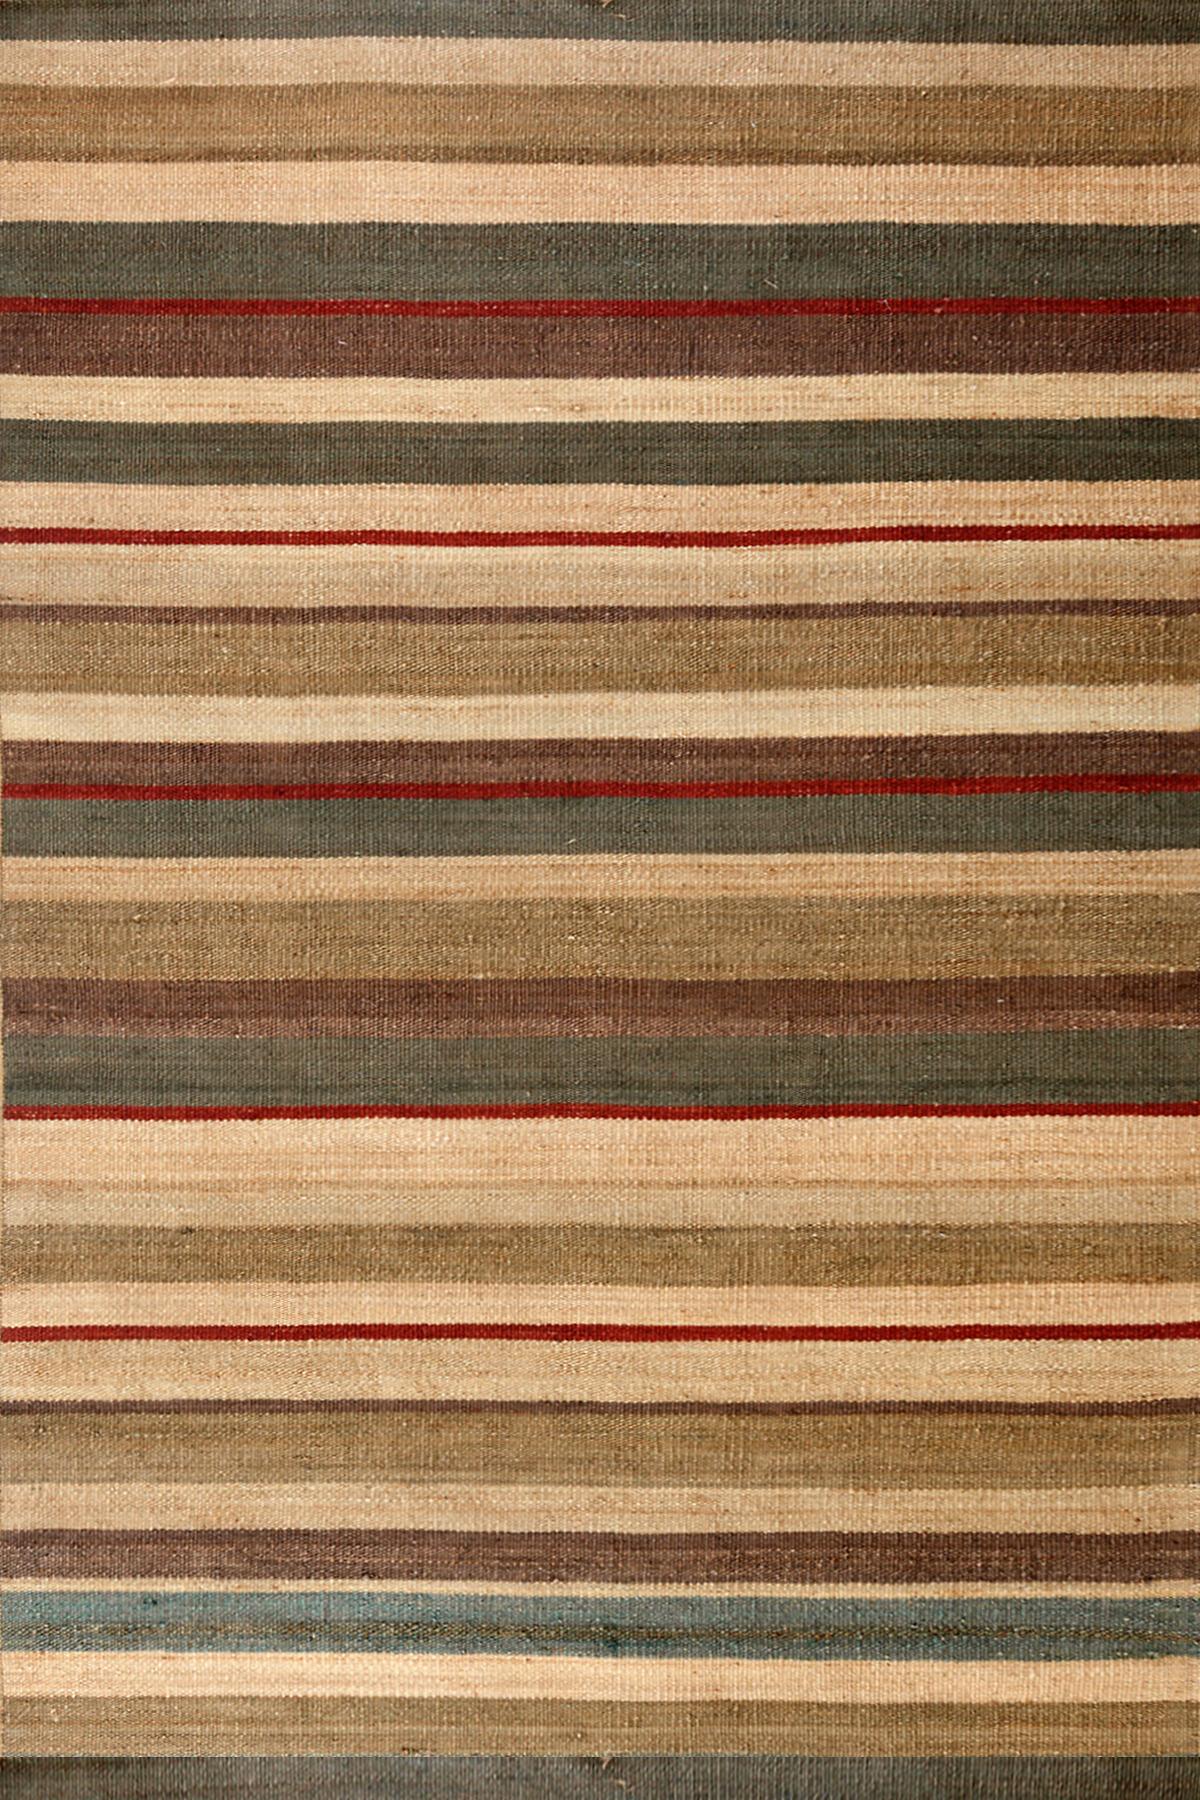 Saddle Stripe Jute Woven Rug